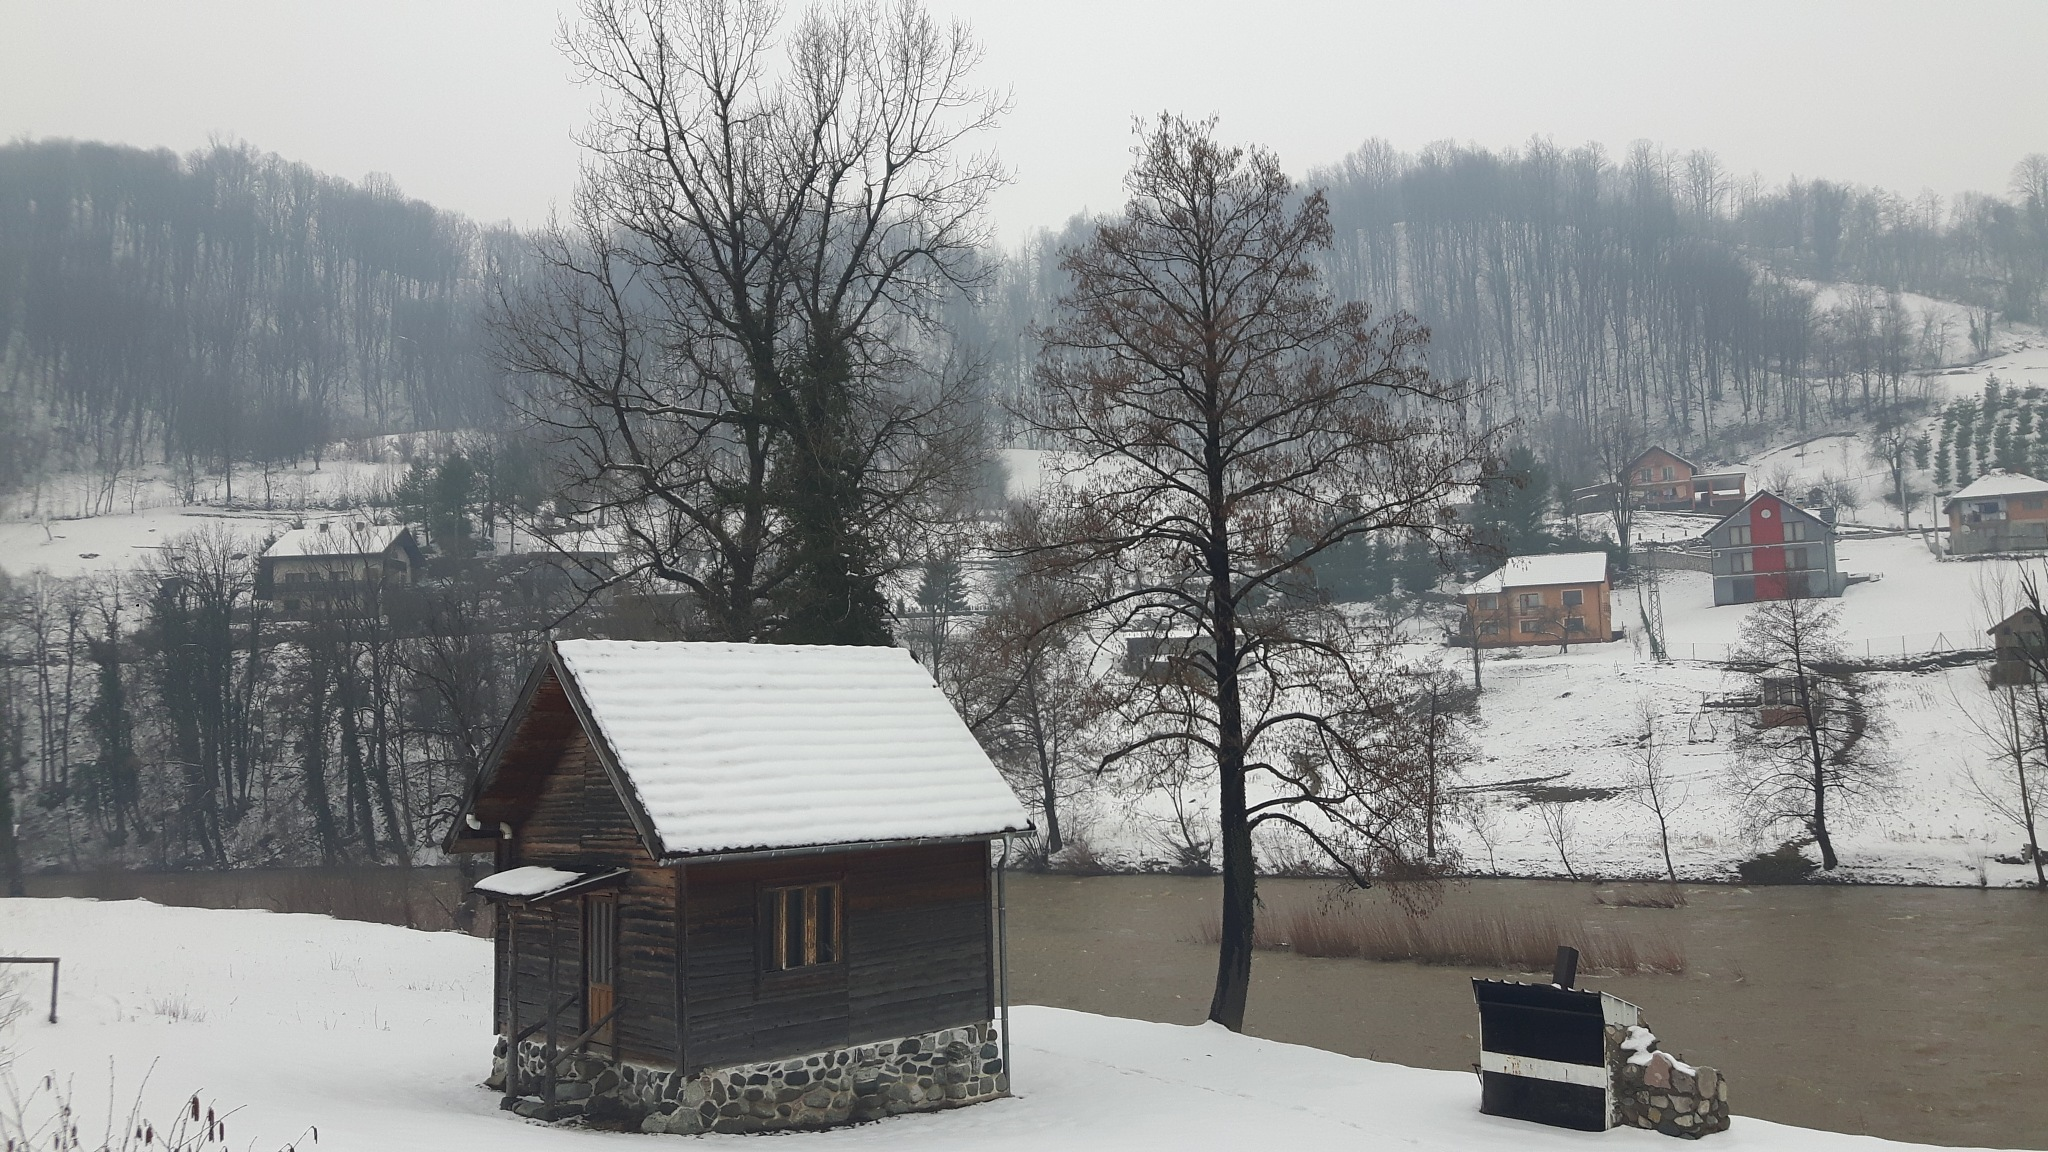 Winter haven besdes river Krivaja by Mevludin_Hasanovic